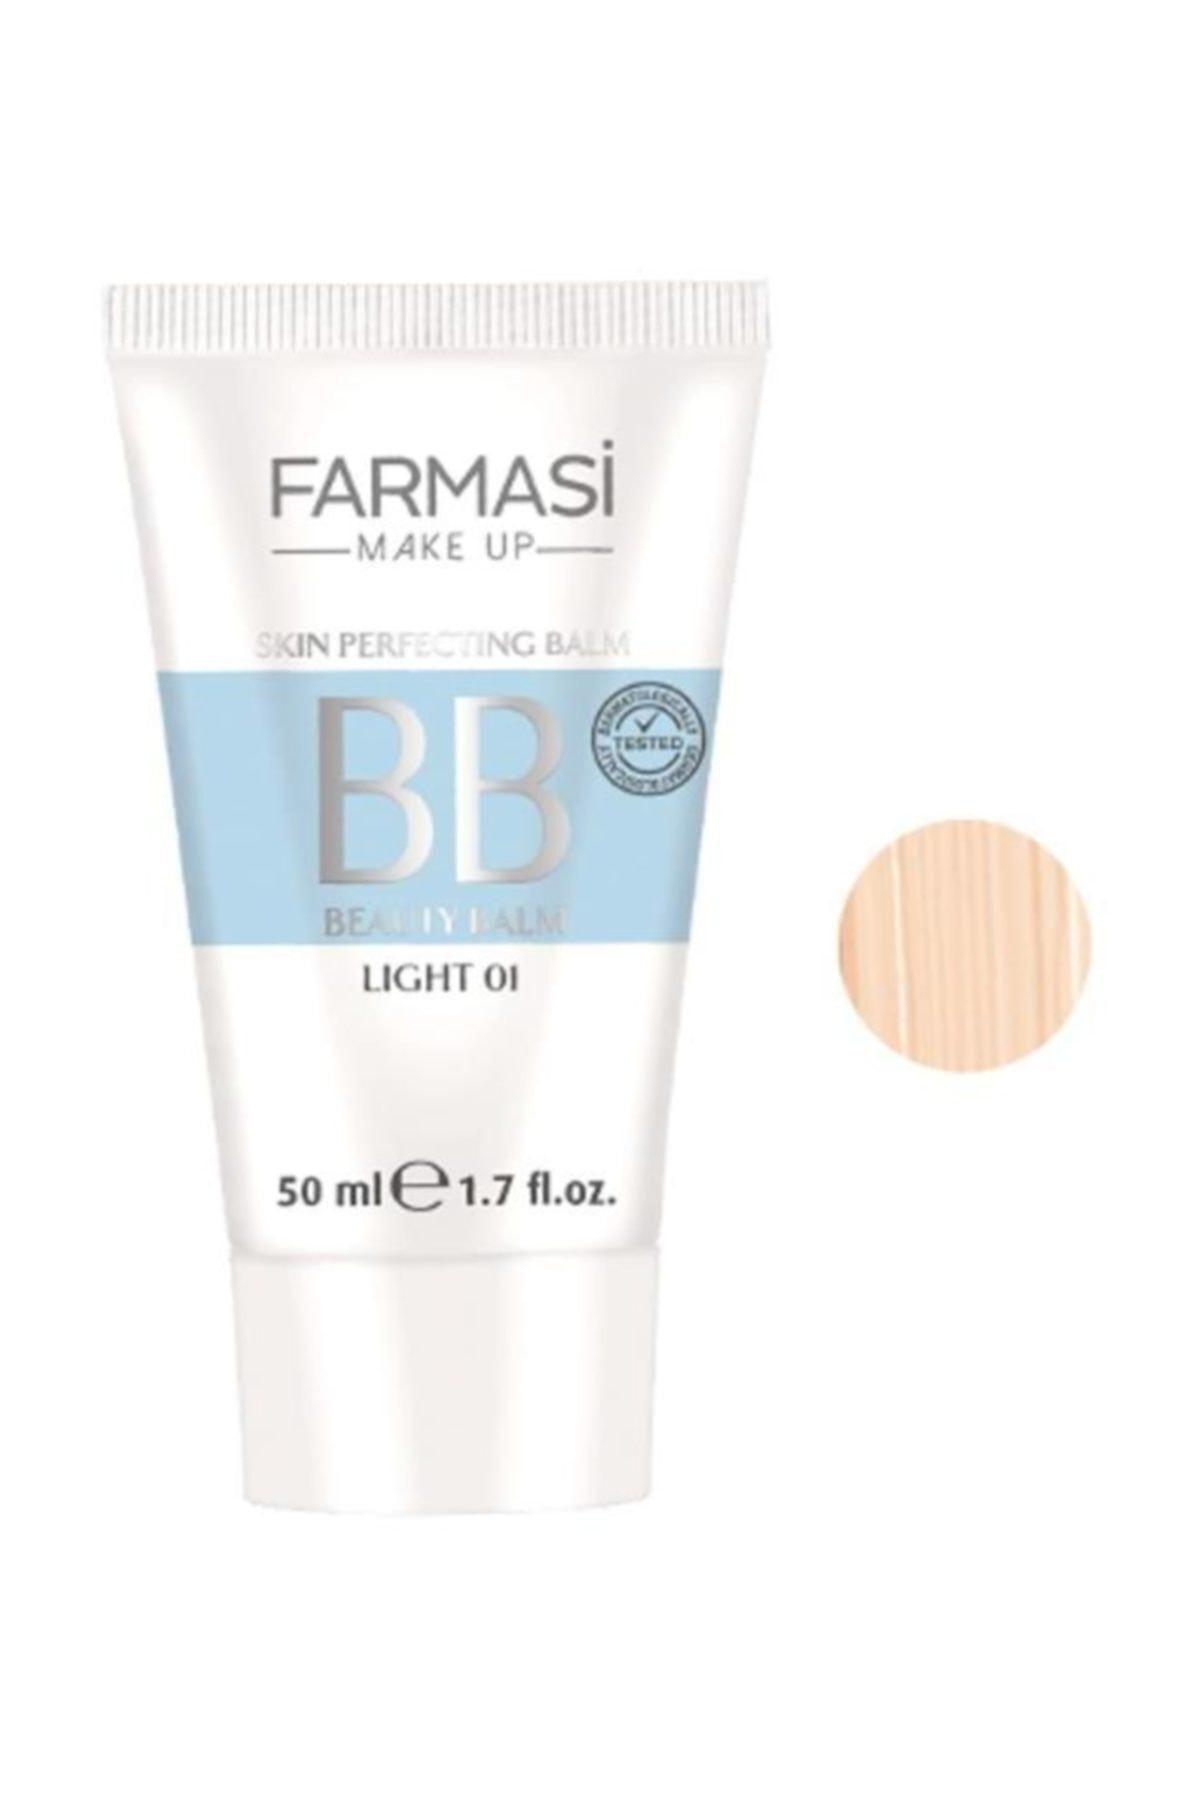 Farmasi Bb Krem - All in One - Açık Renk 50ml 8690131773915 1